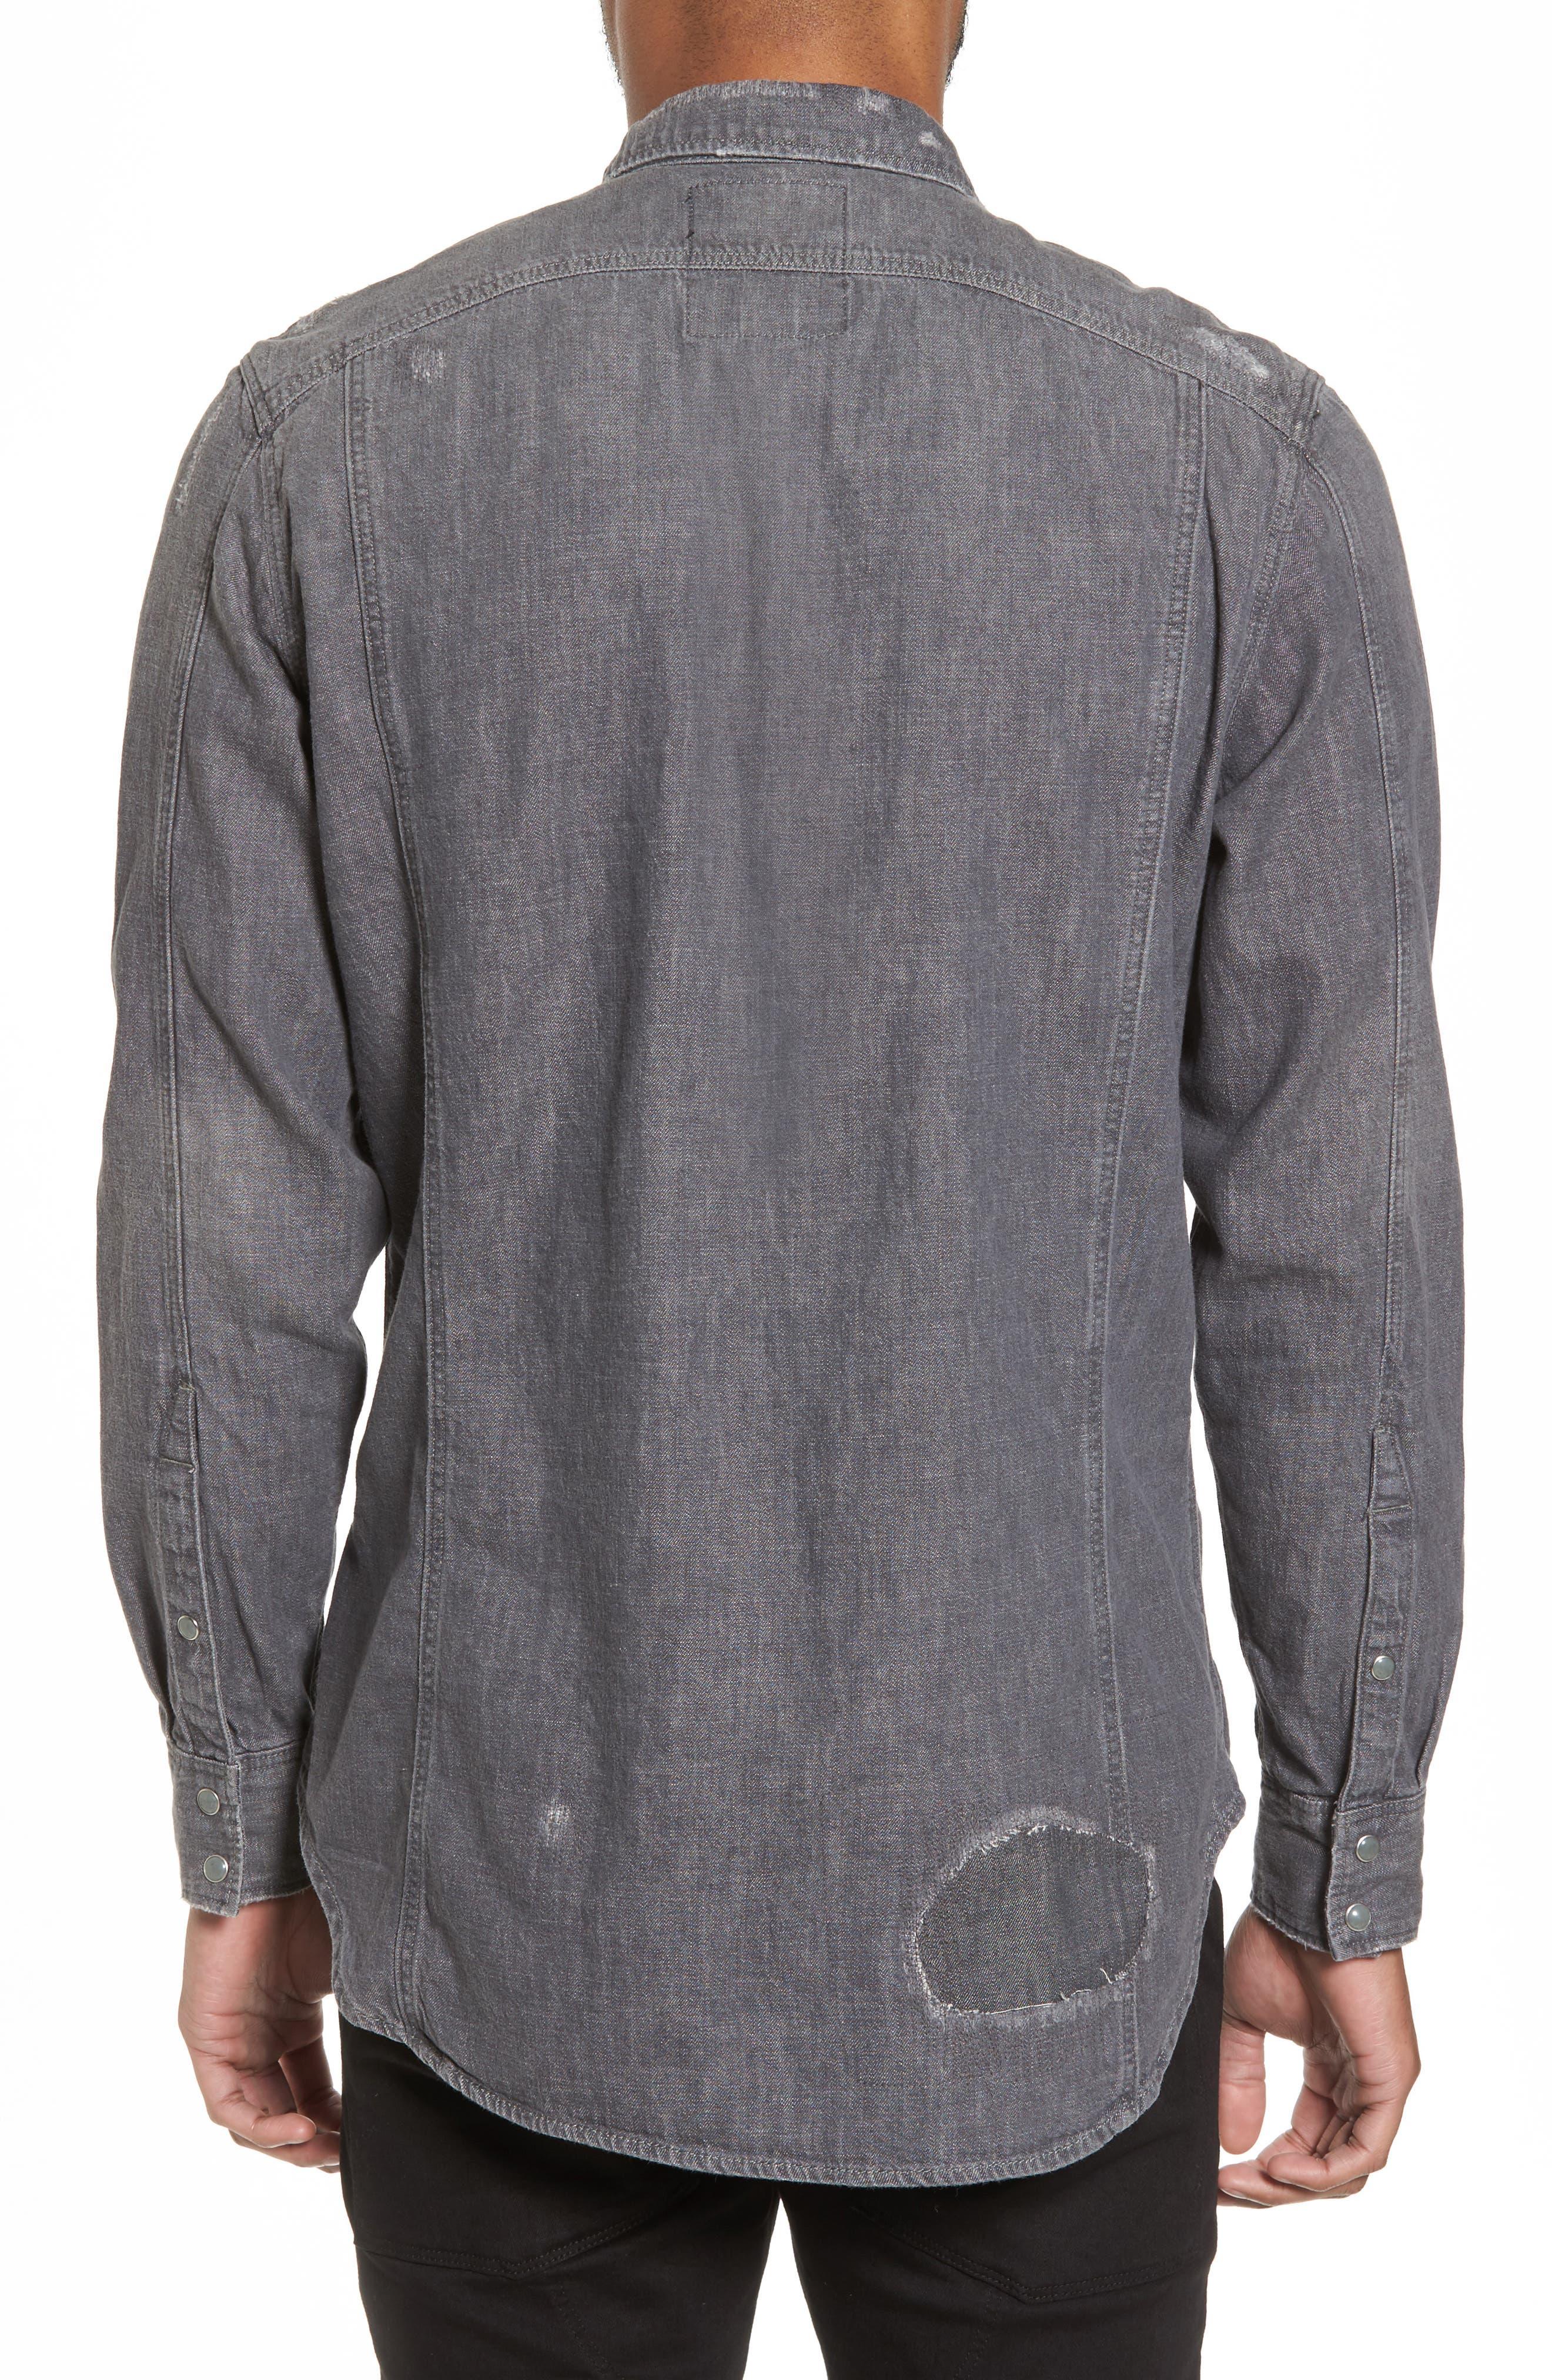 3301 Craser Denim Shirt,                             Alternate thumbnail 2, color,                             Medium Aged Restored